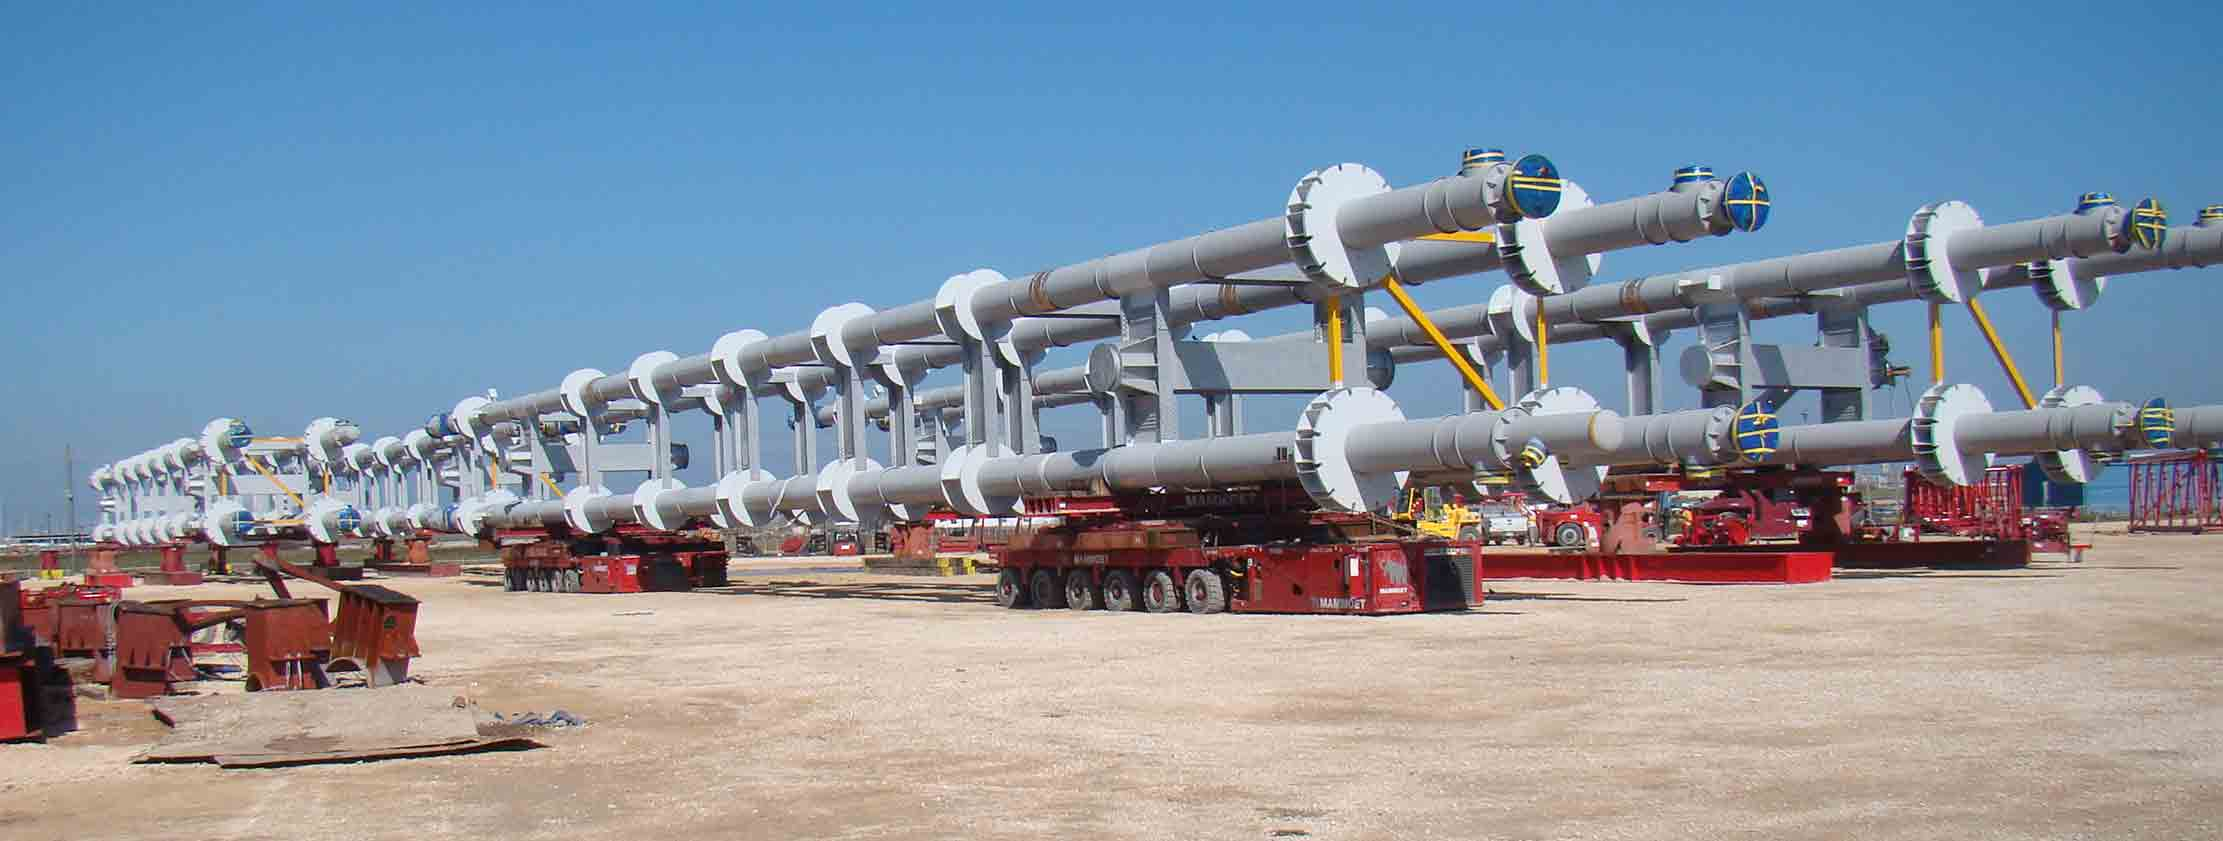 breakbulk shipping port freeport texas